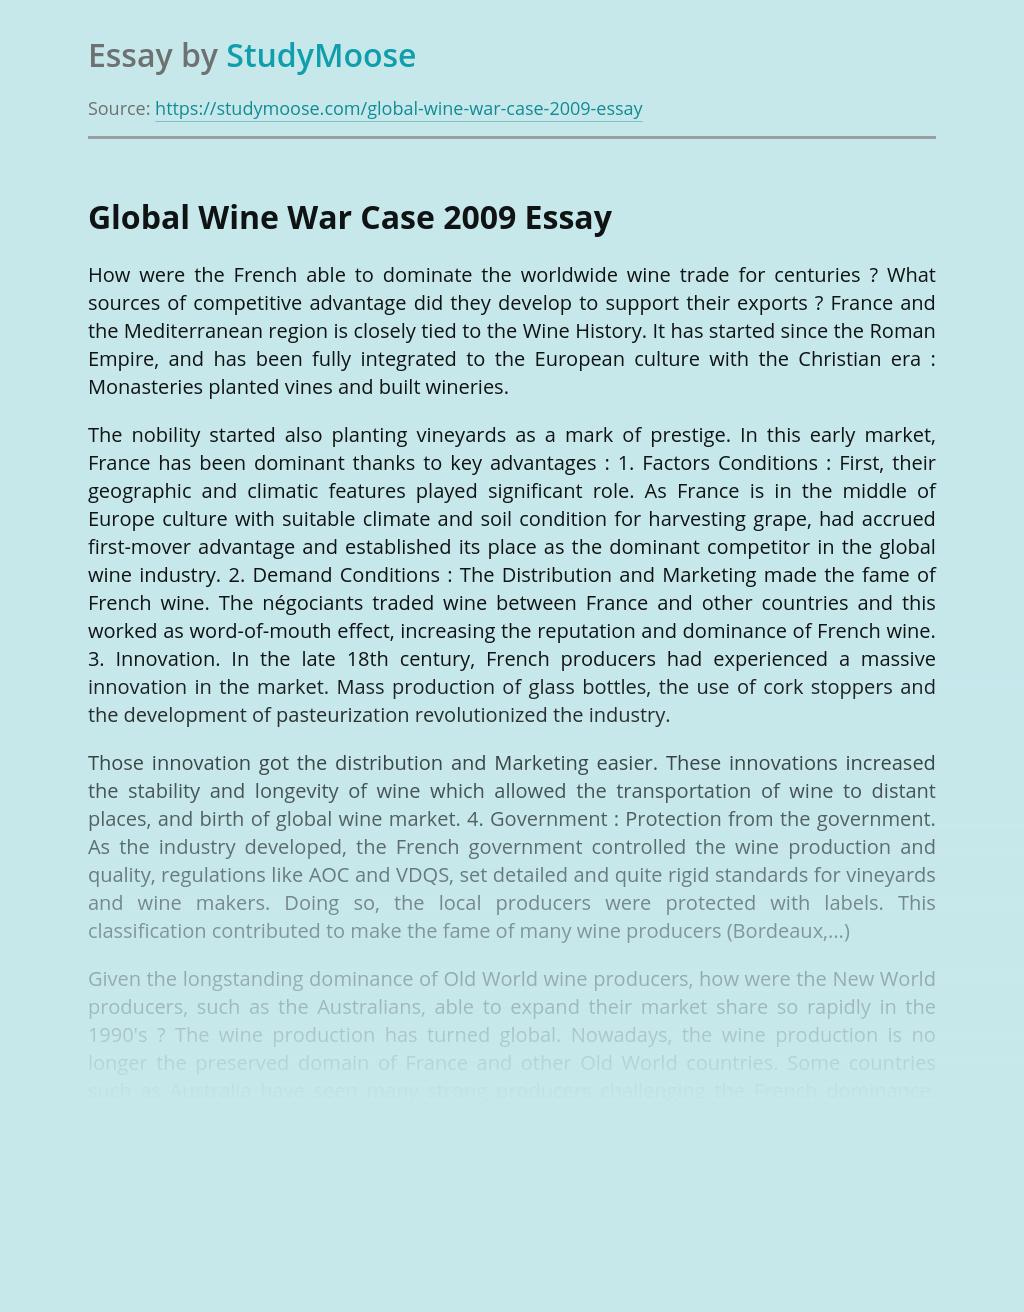 Global Wine War Case 2009